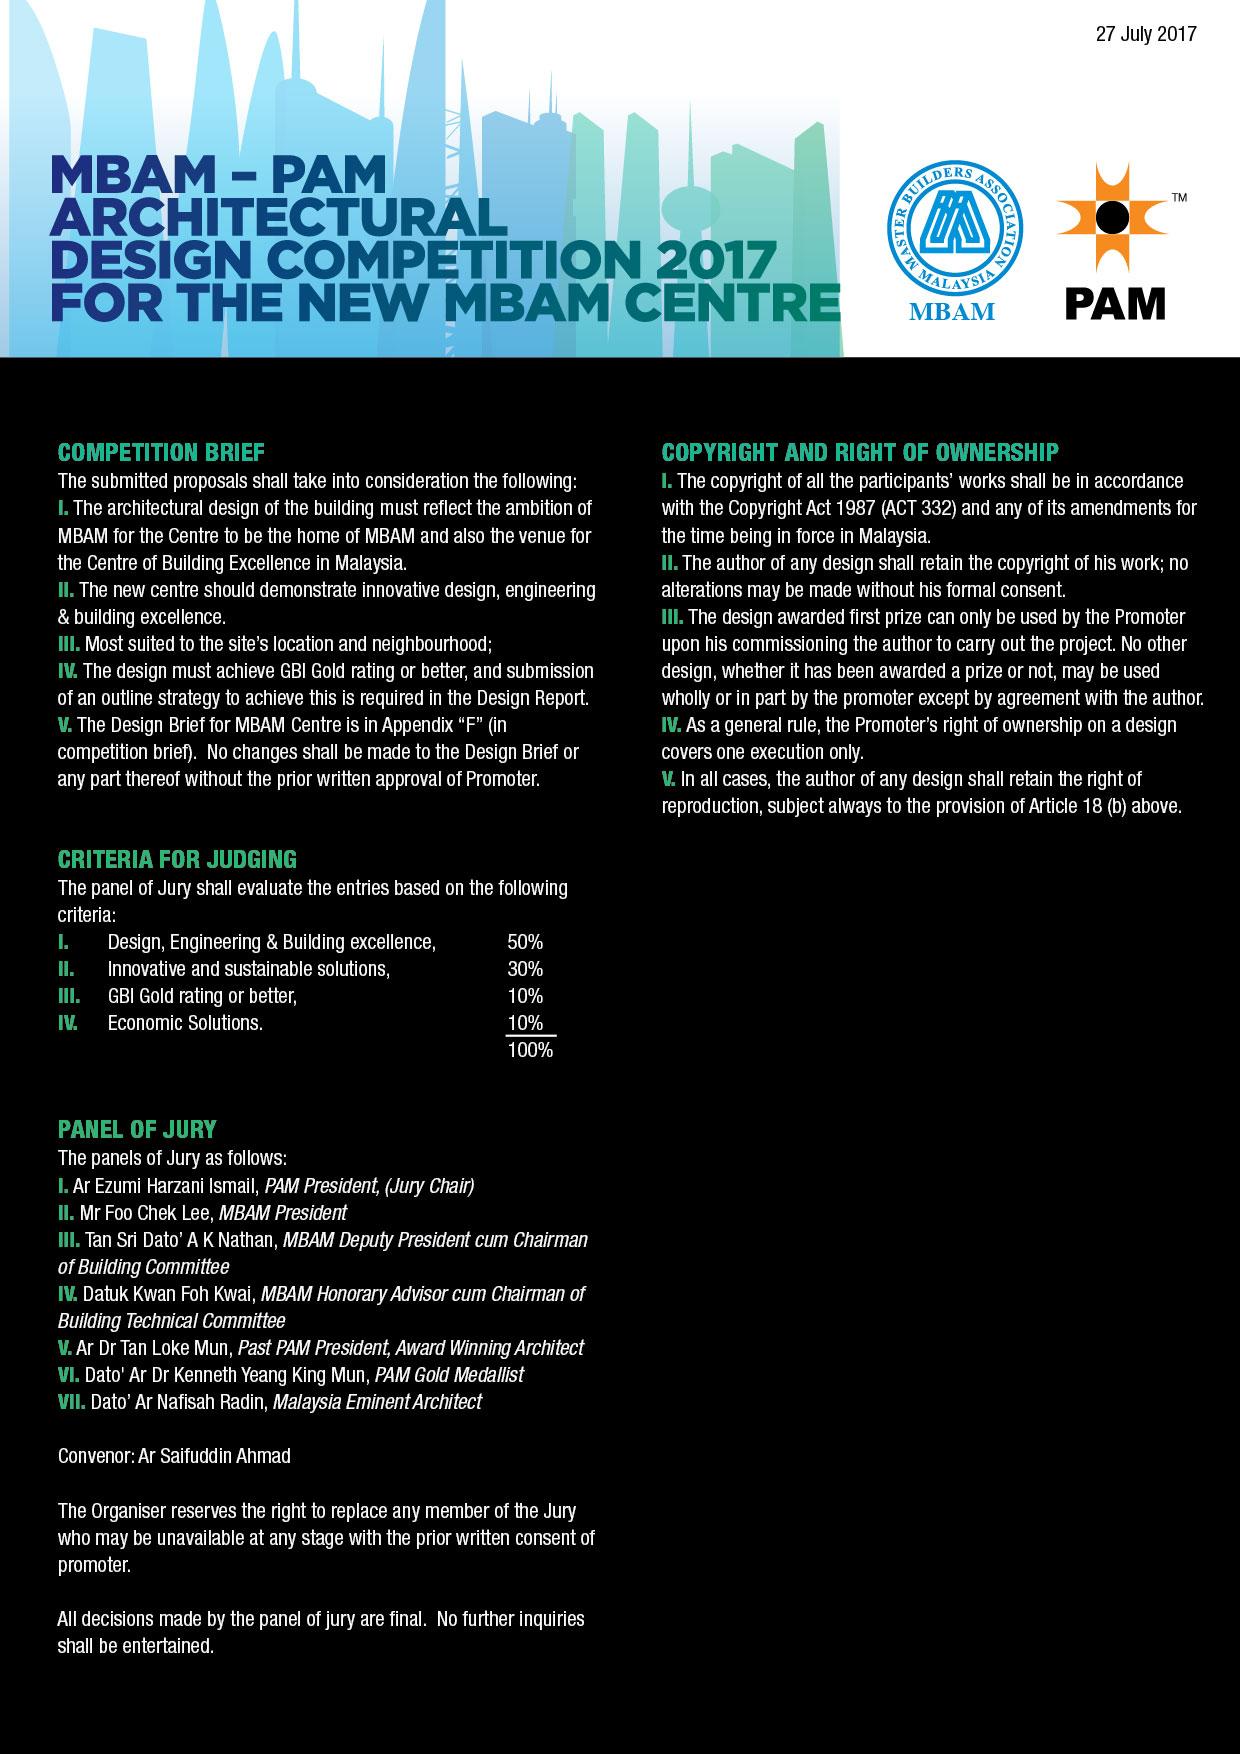 MBAM_PAM_ArchDComp2017_Flyer_p2-02